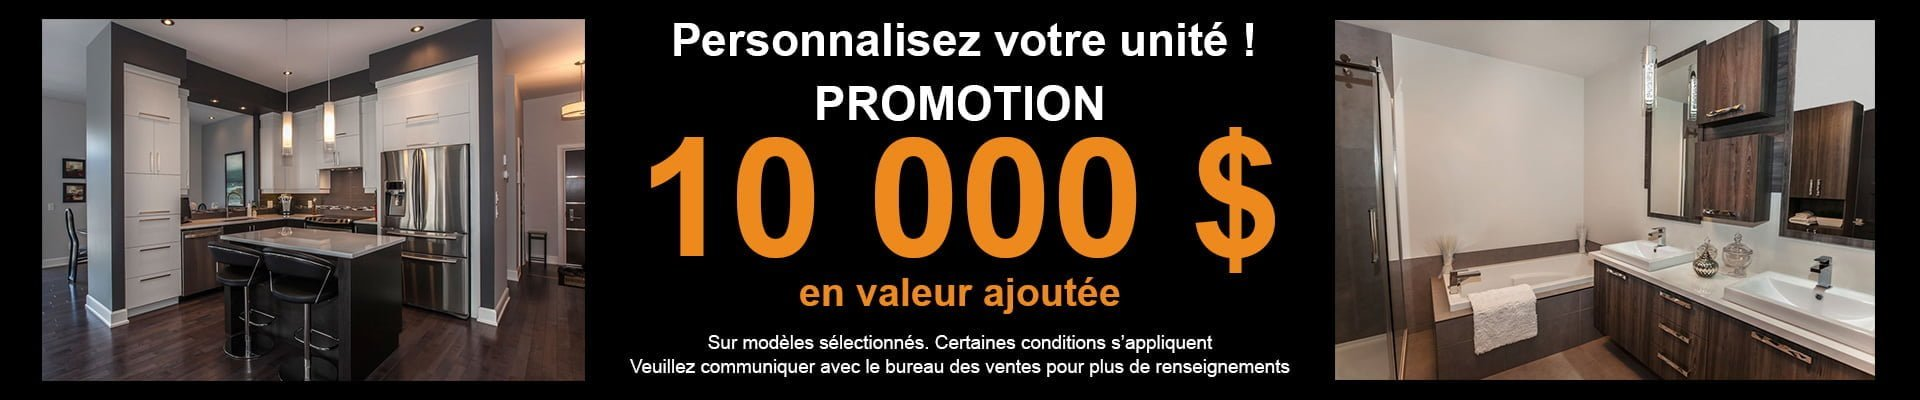 promotion-ete-condos